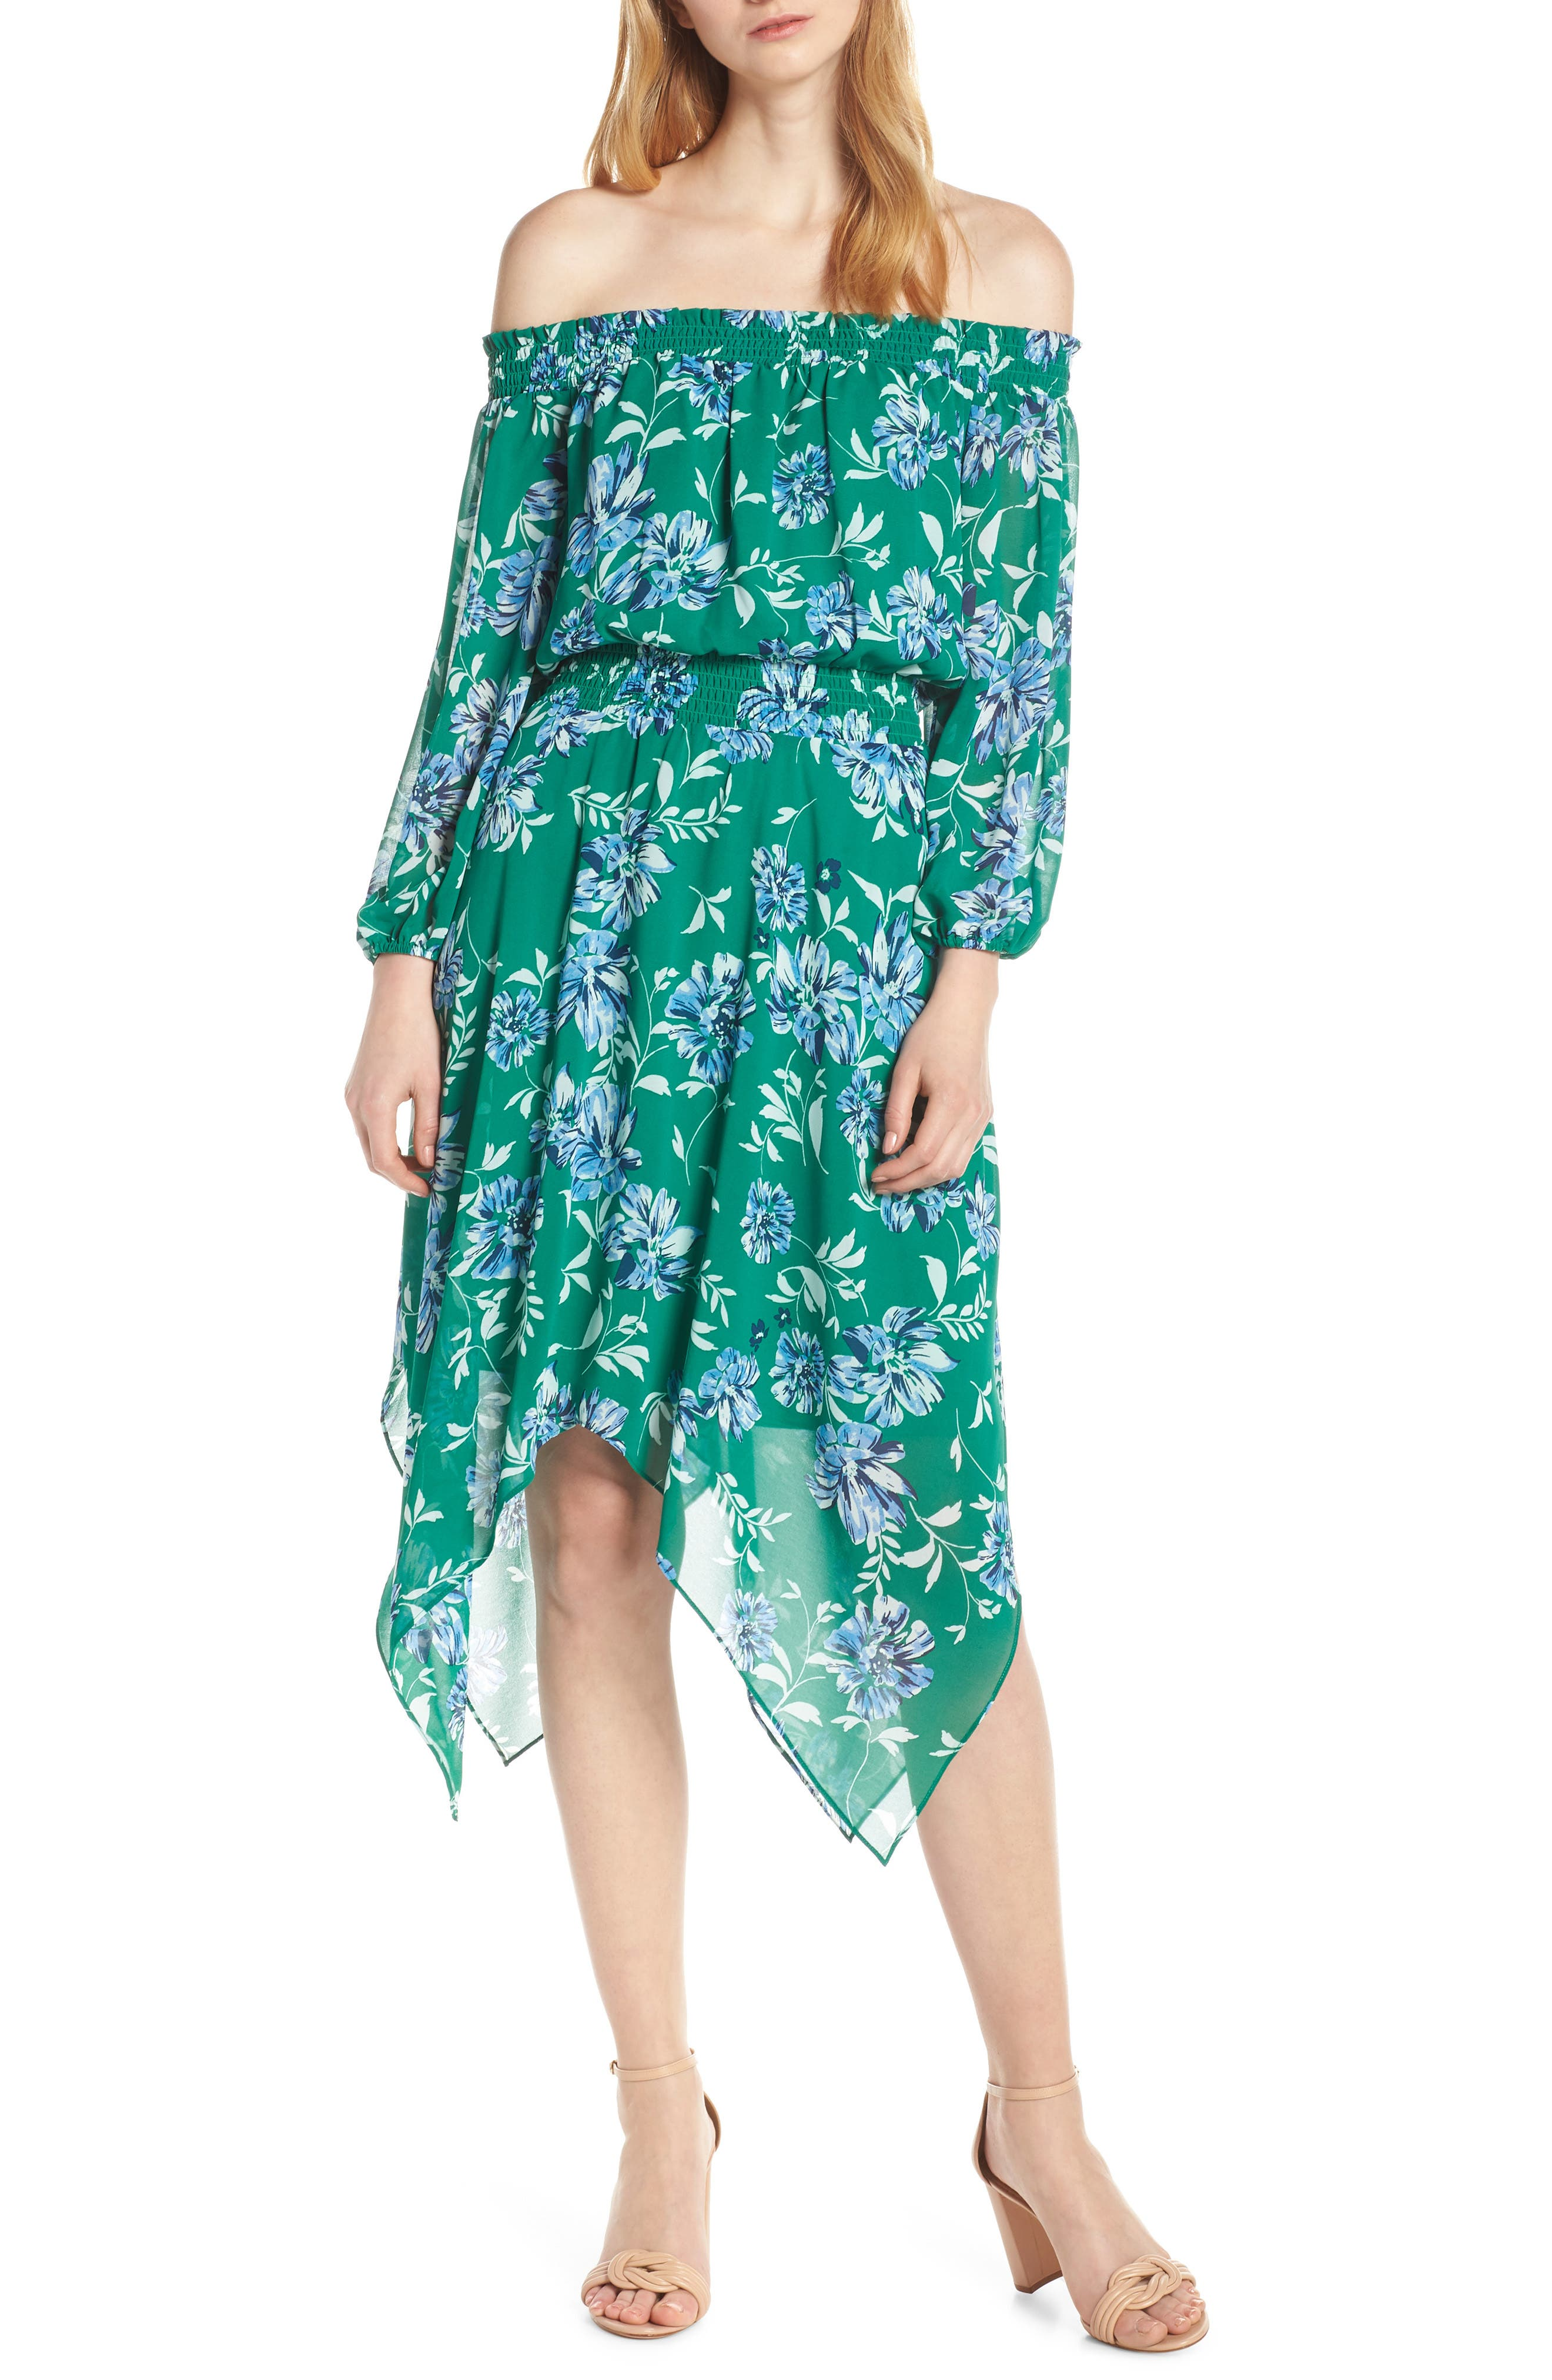 CHARLES HENRY, Smocked Handkerchief Hem Dress, Main thumbnail 1, color, KELLY GREEN FLORAL